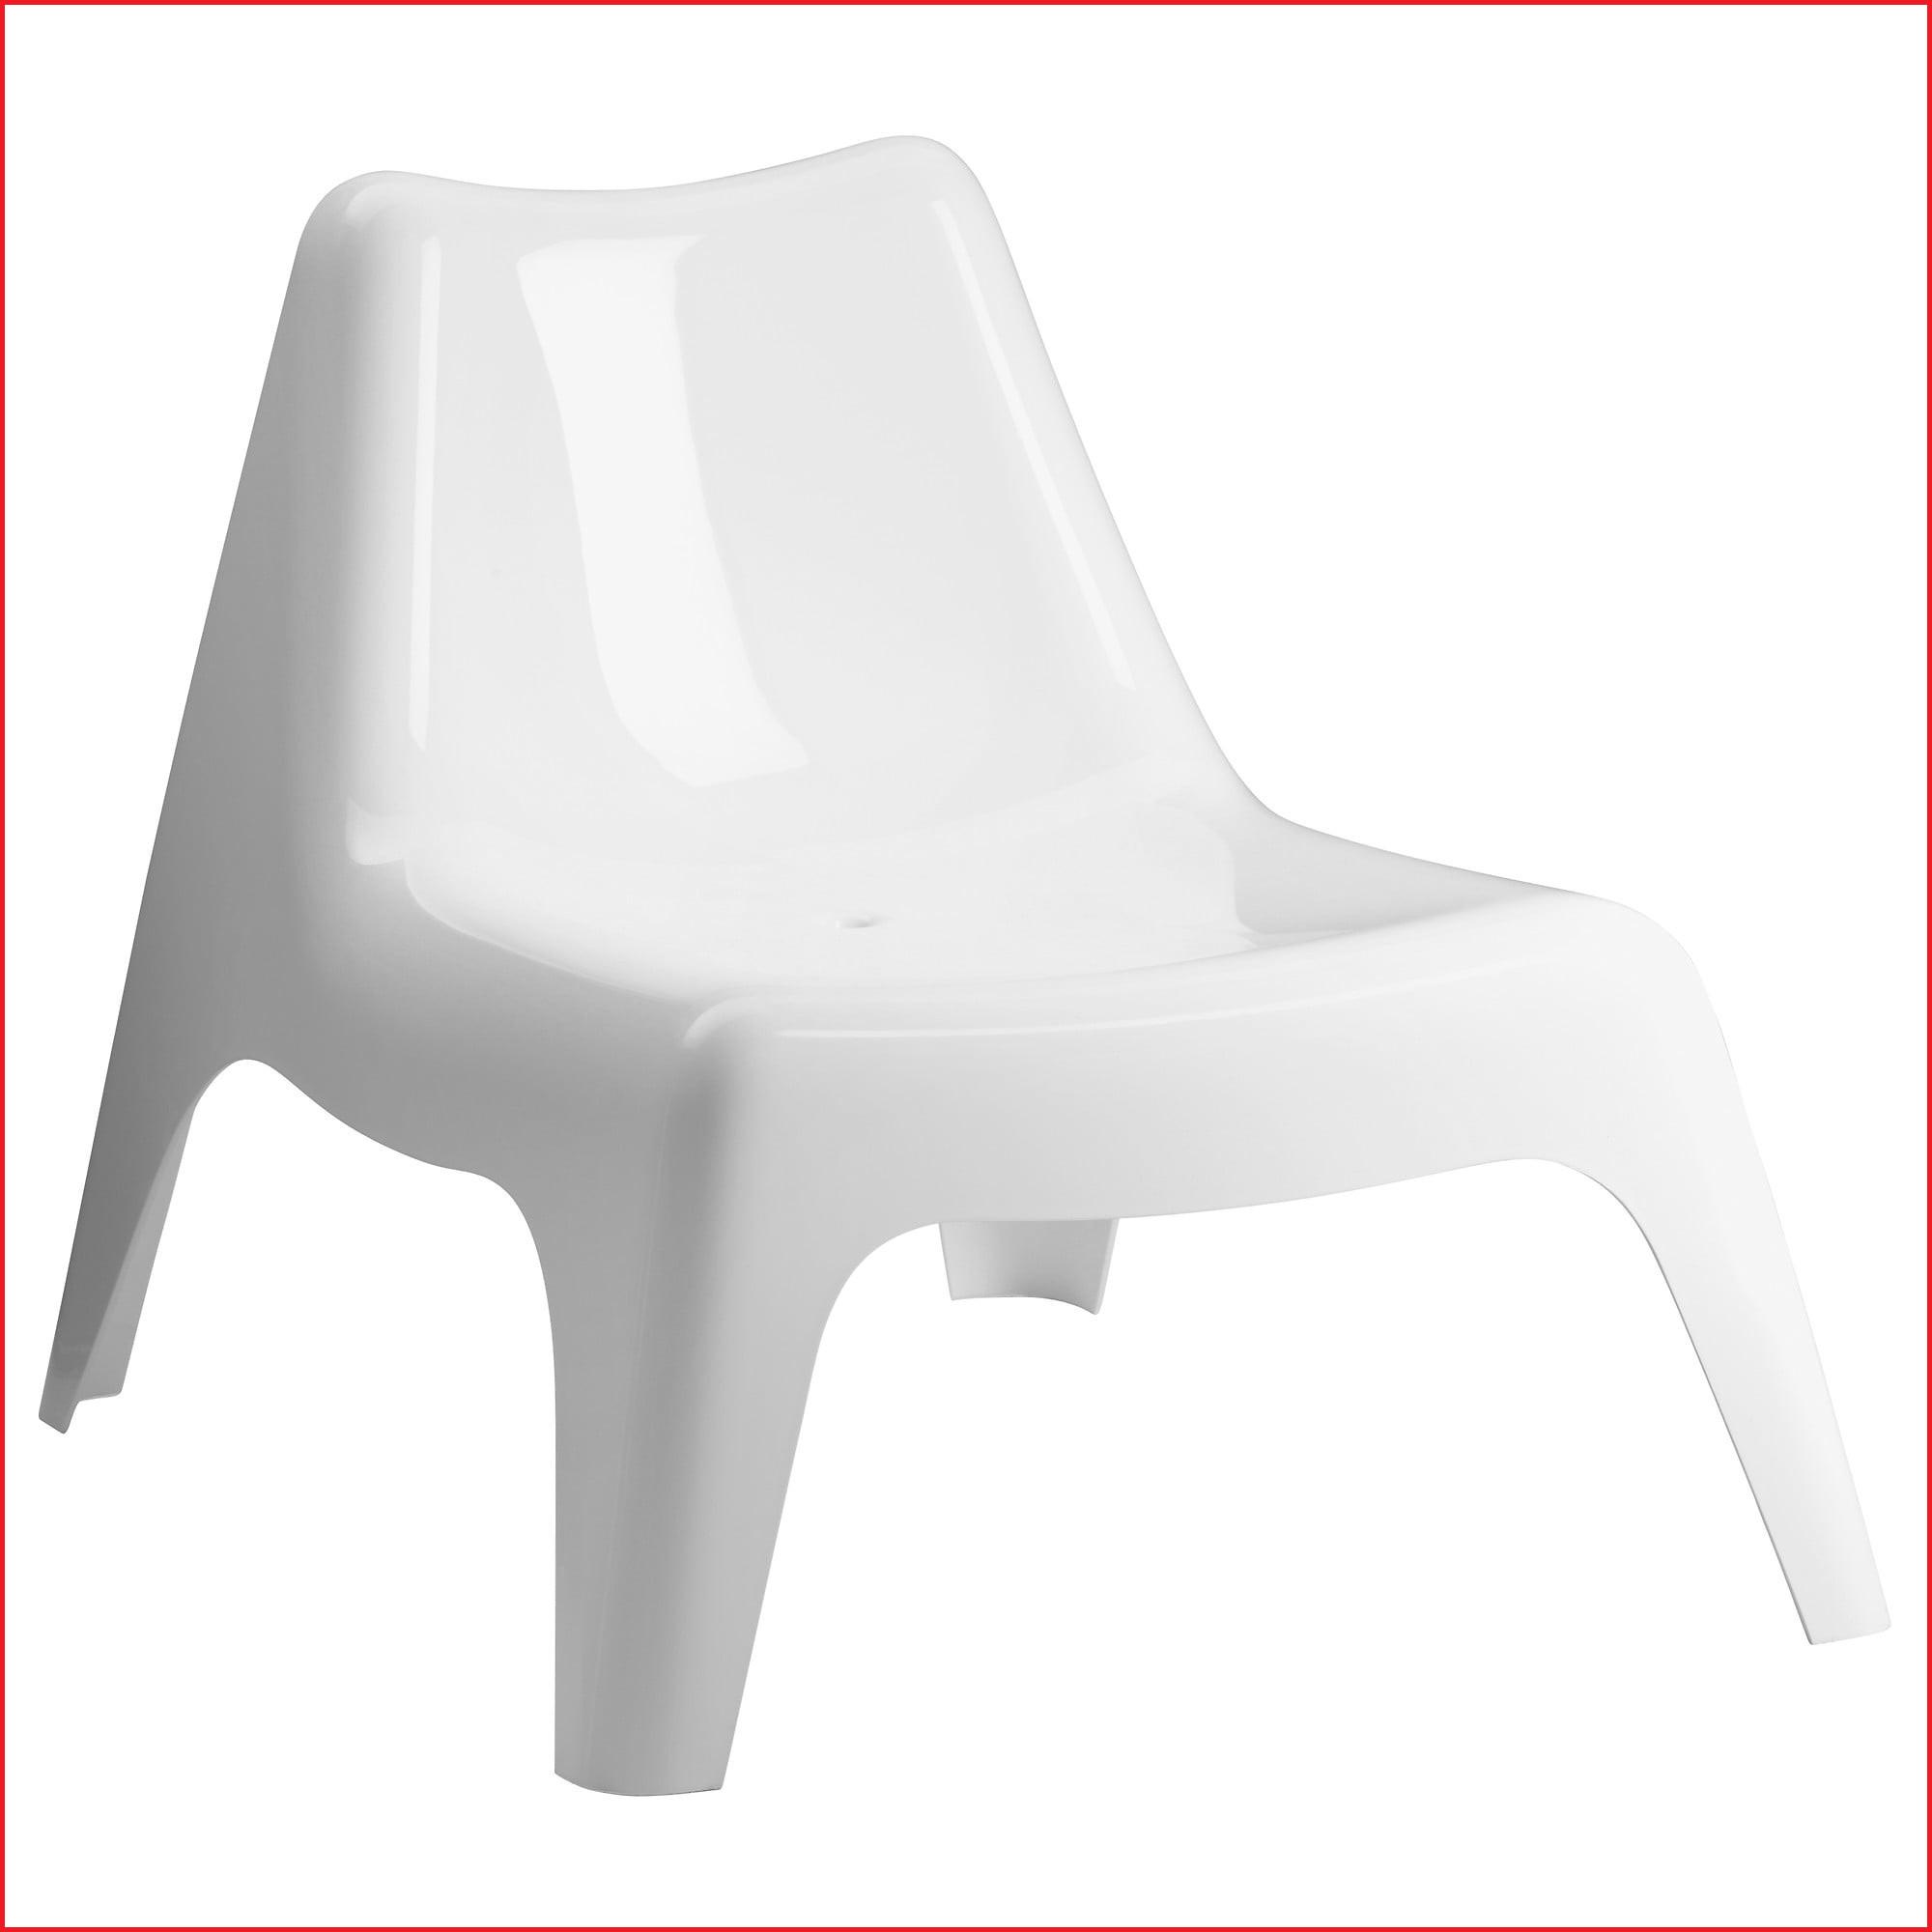 Sillas De Plastico Baratas 9ddf Sillas De Plà Stico Baratas Ikea Ps V G Silla Exter Blanco